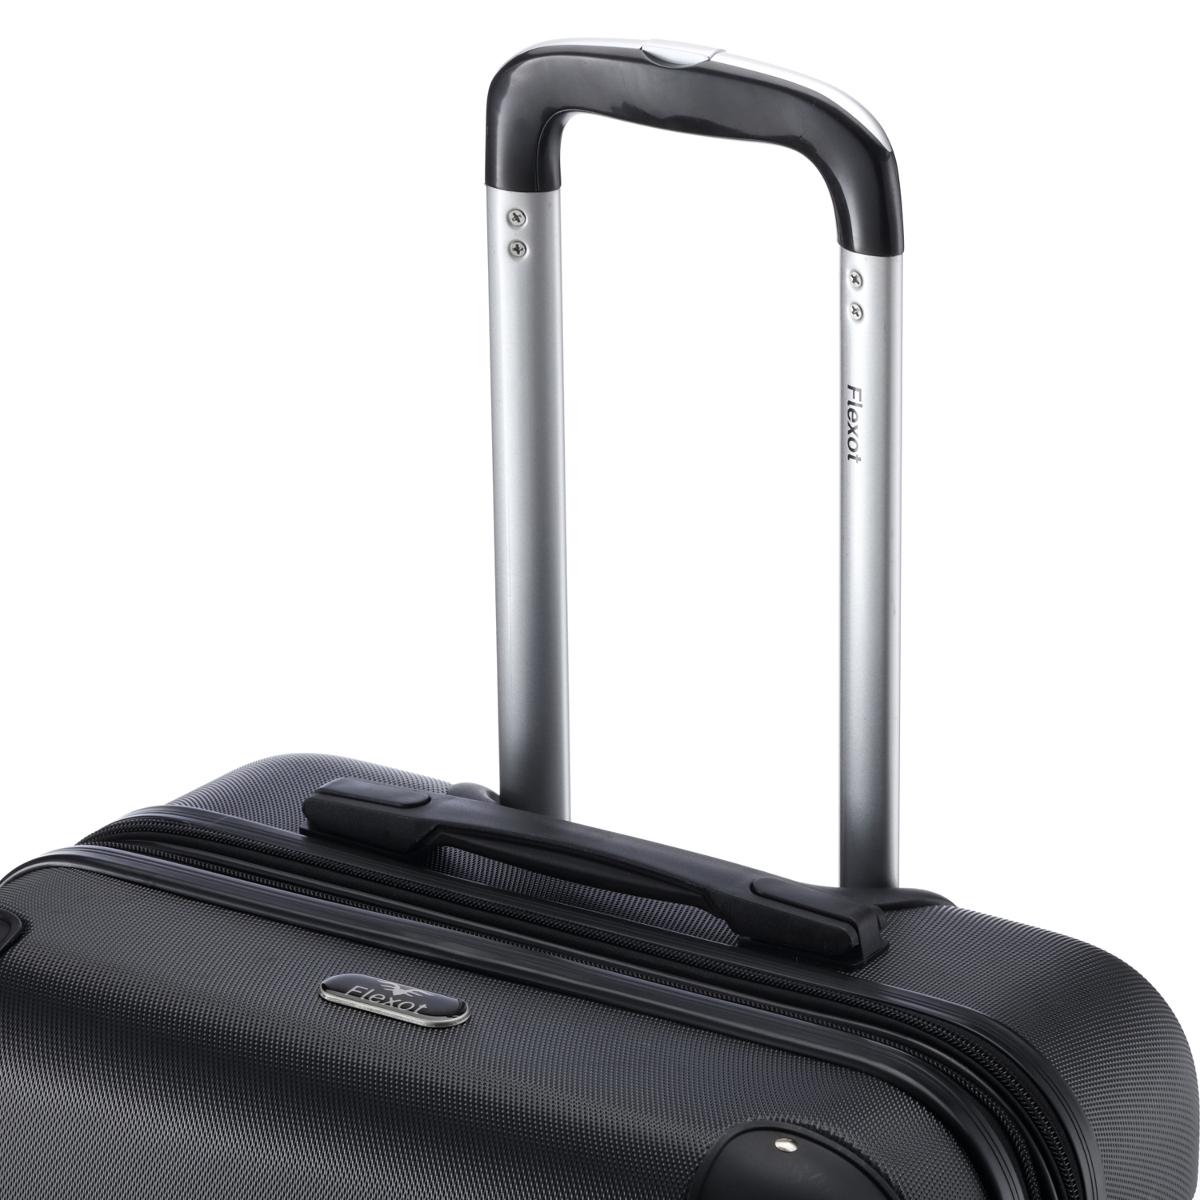 Koffer-Flexot-2045-Hartschalenkoffer-Trolley-Kofferset-Reisekoffer-M-L-XL-Set Indexbild 42